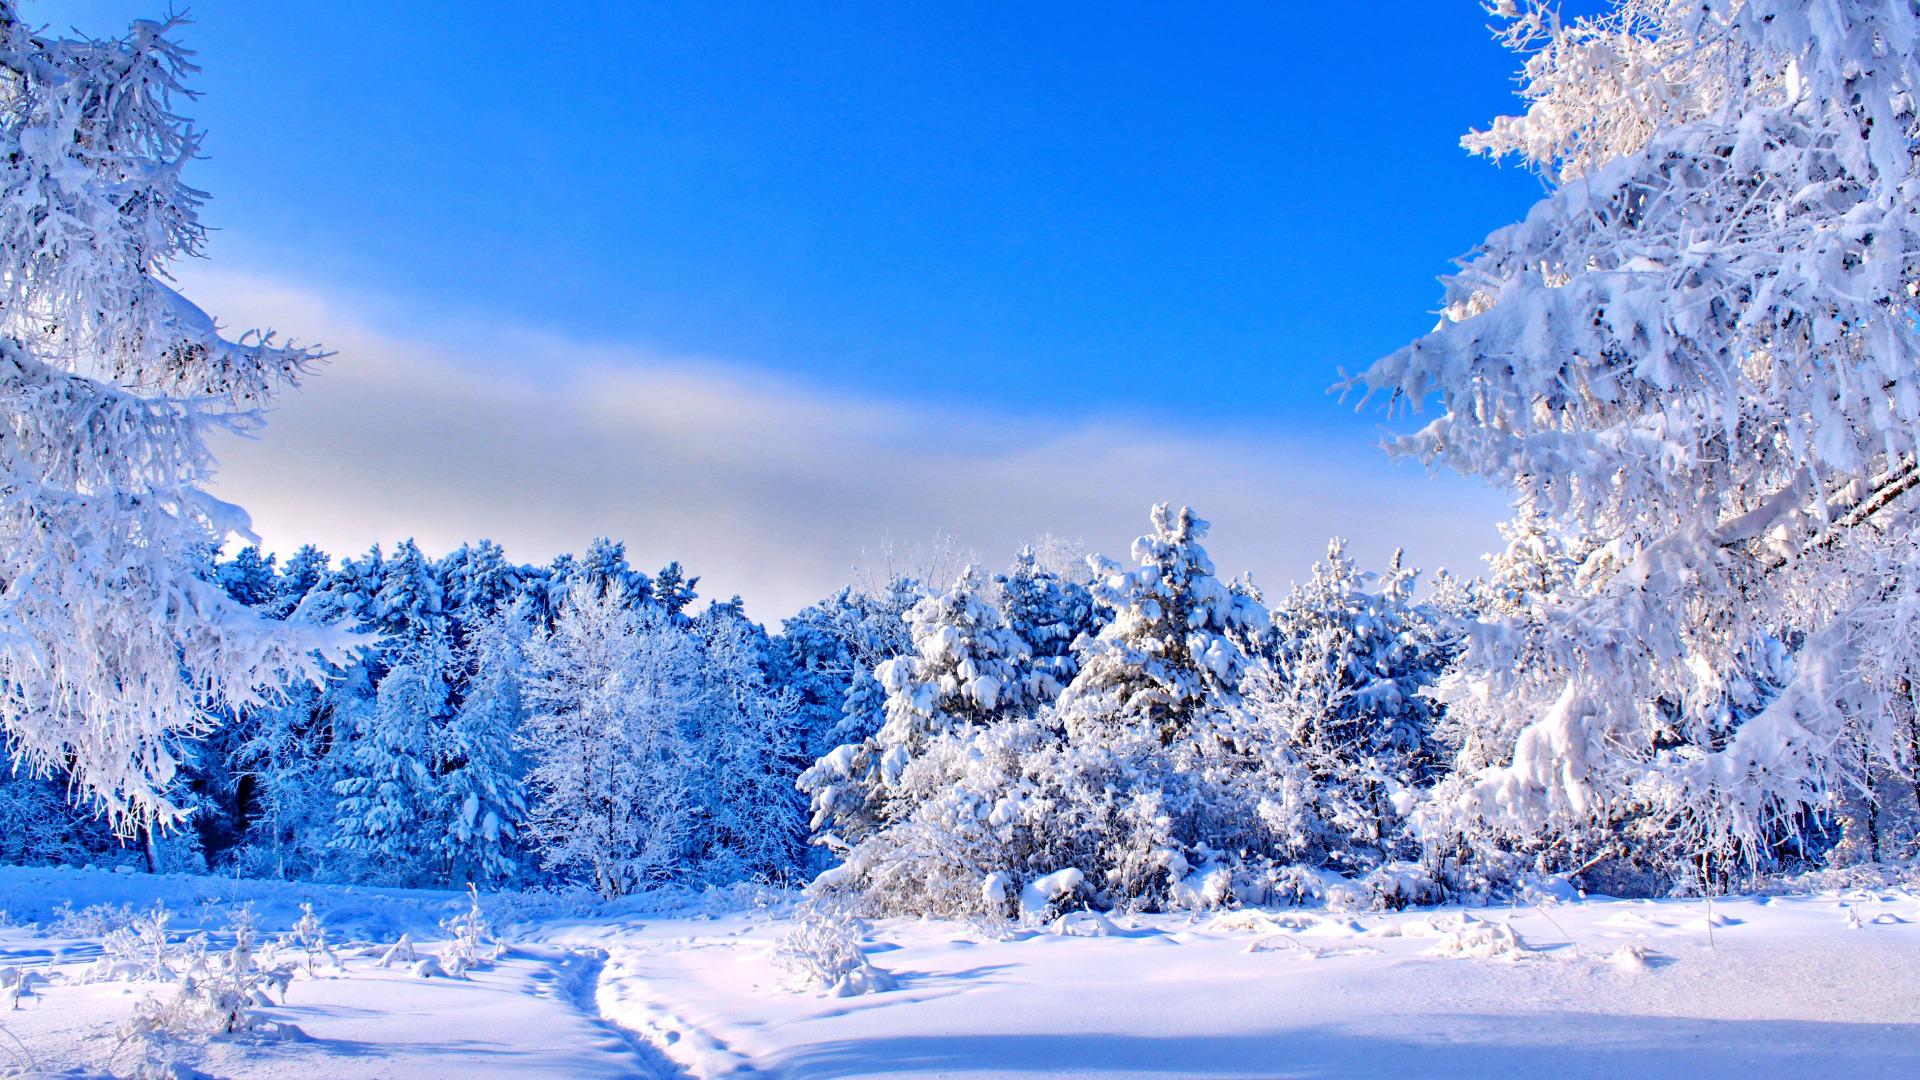 Картинка на рабочий стол зимний день